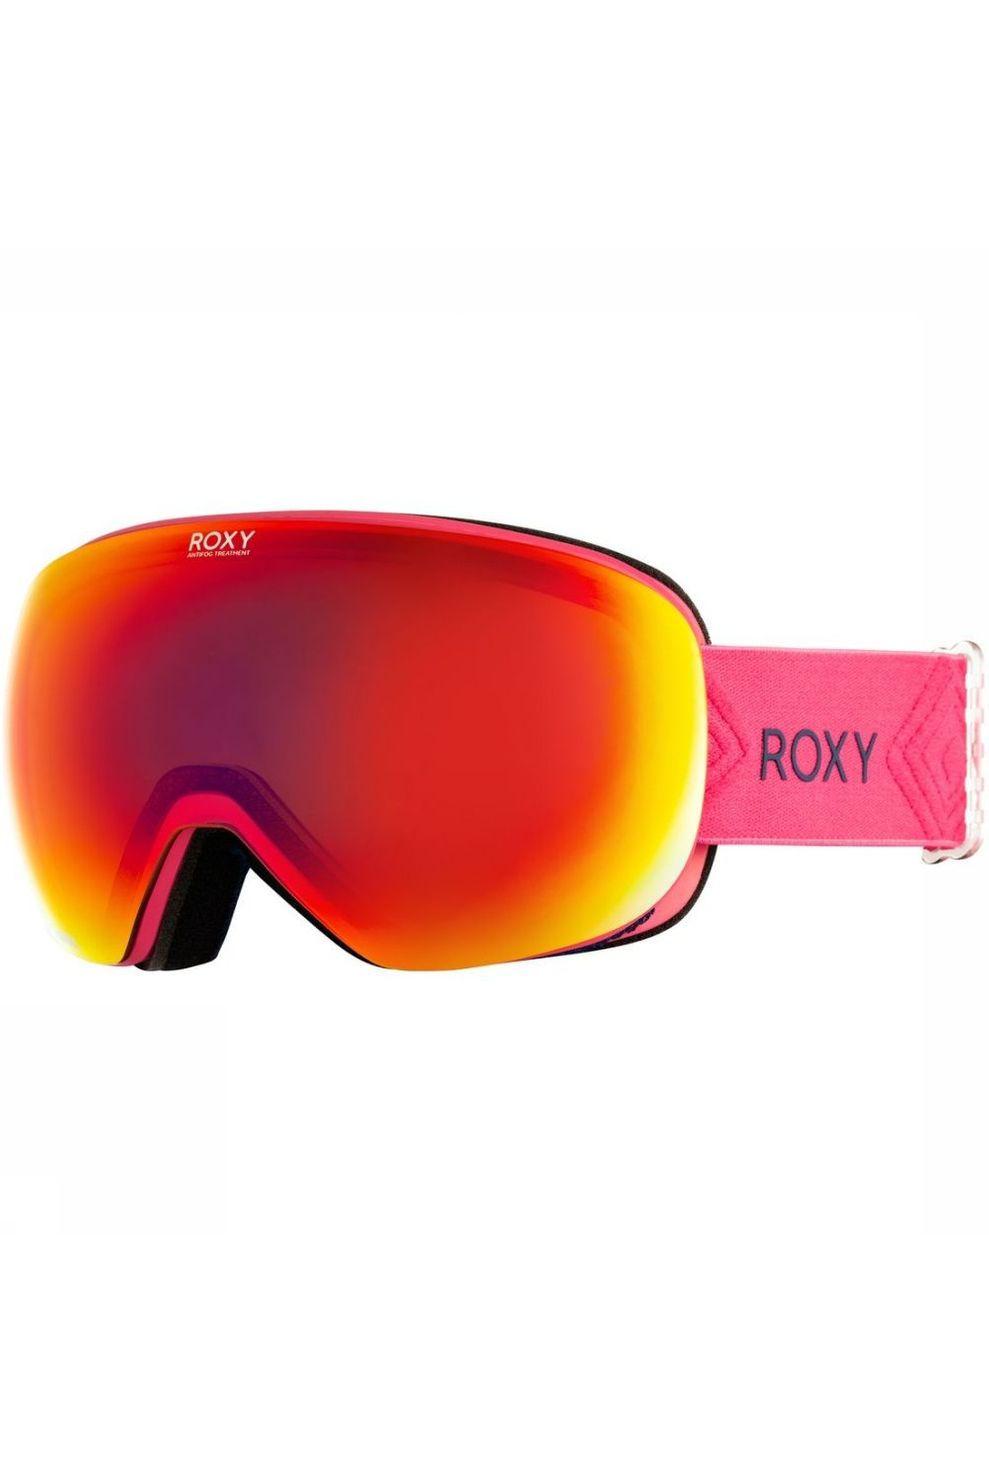 Roxy Skibril Popscreen - Roze/Rood